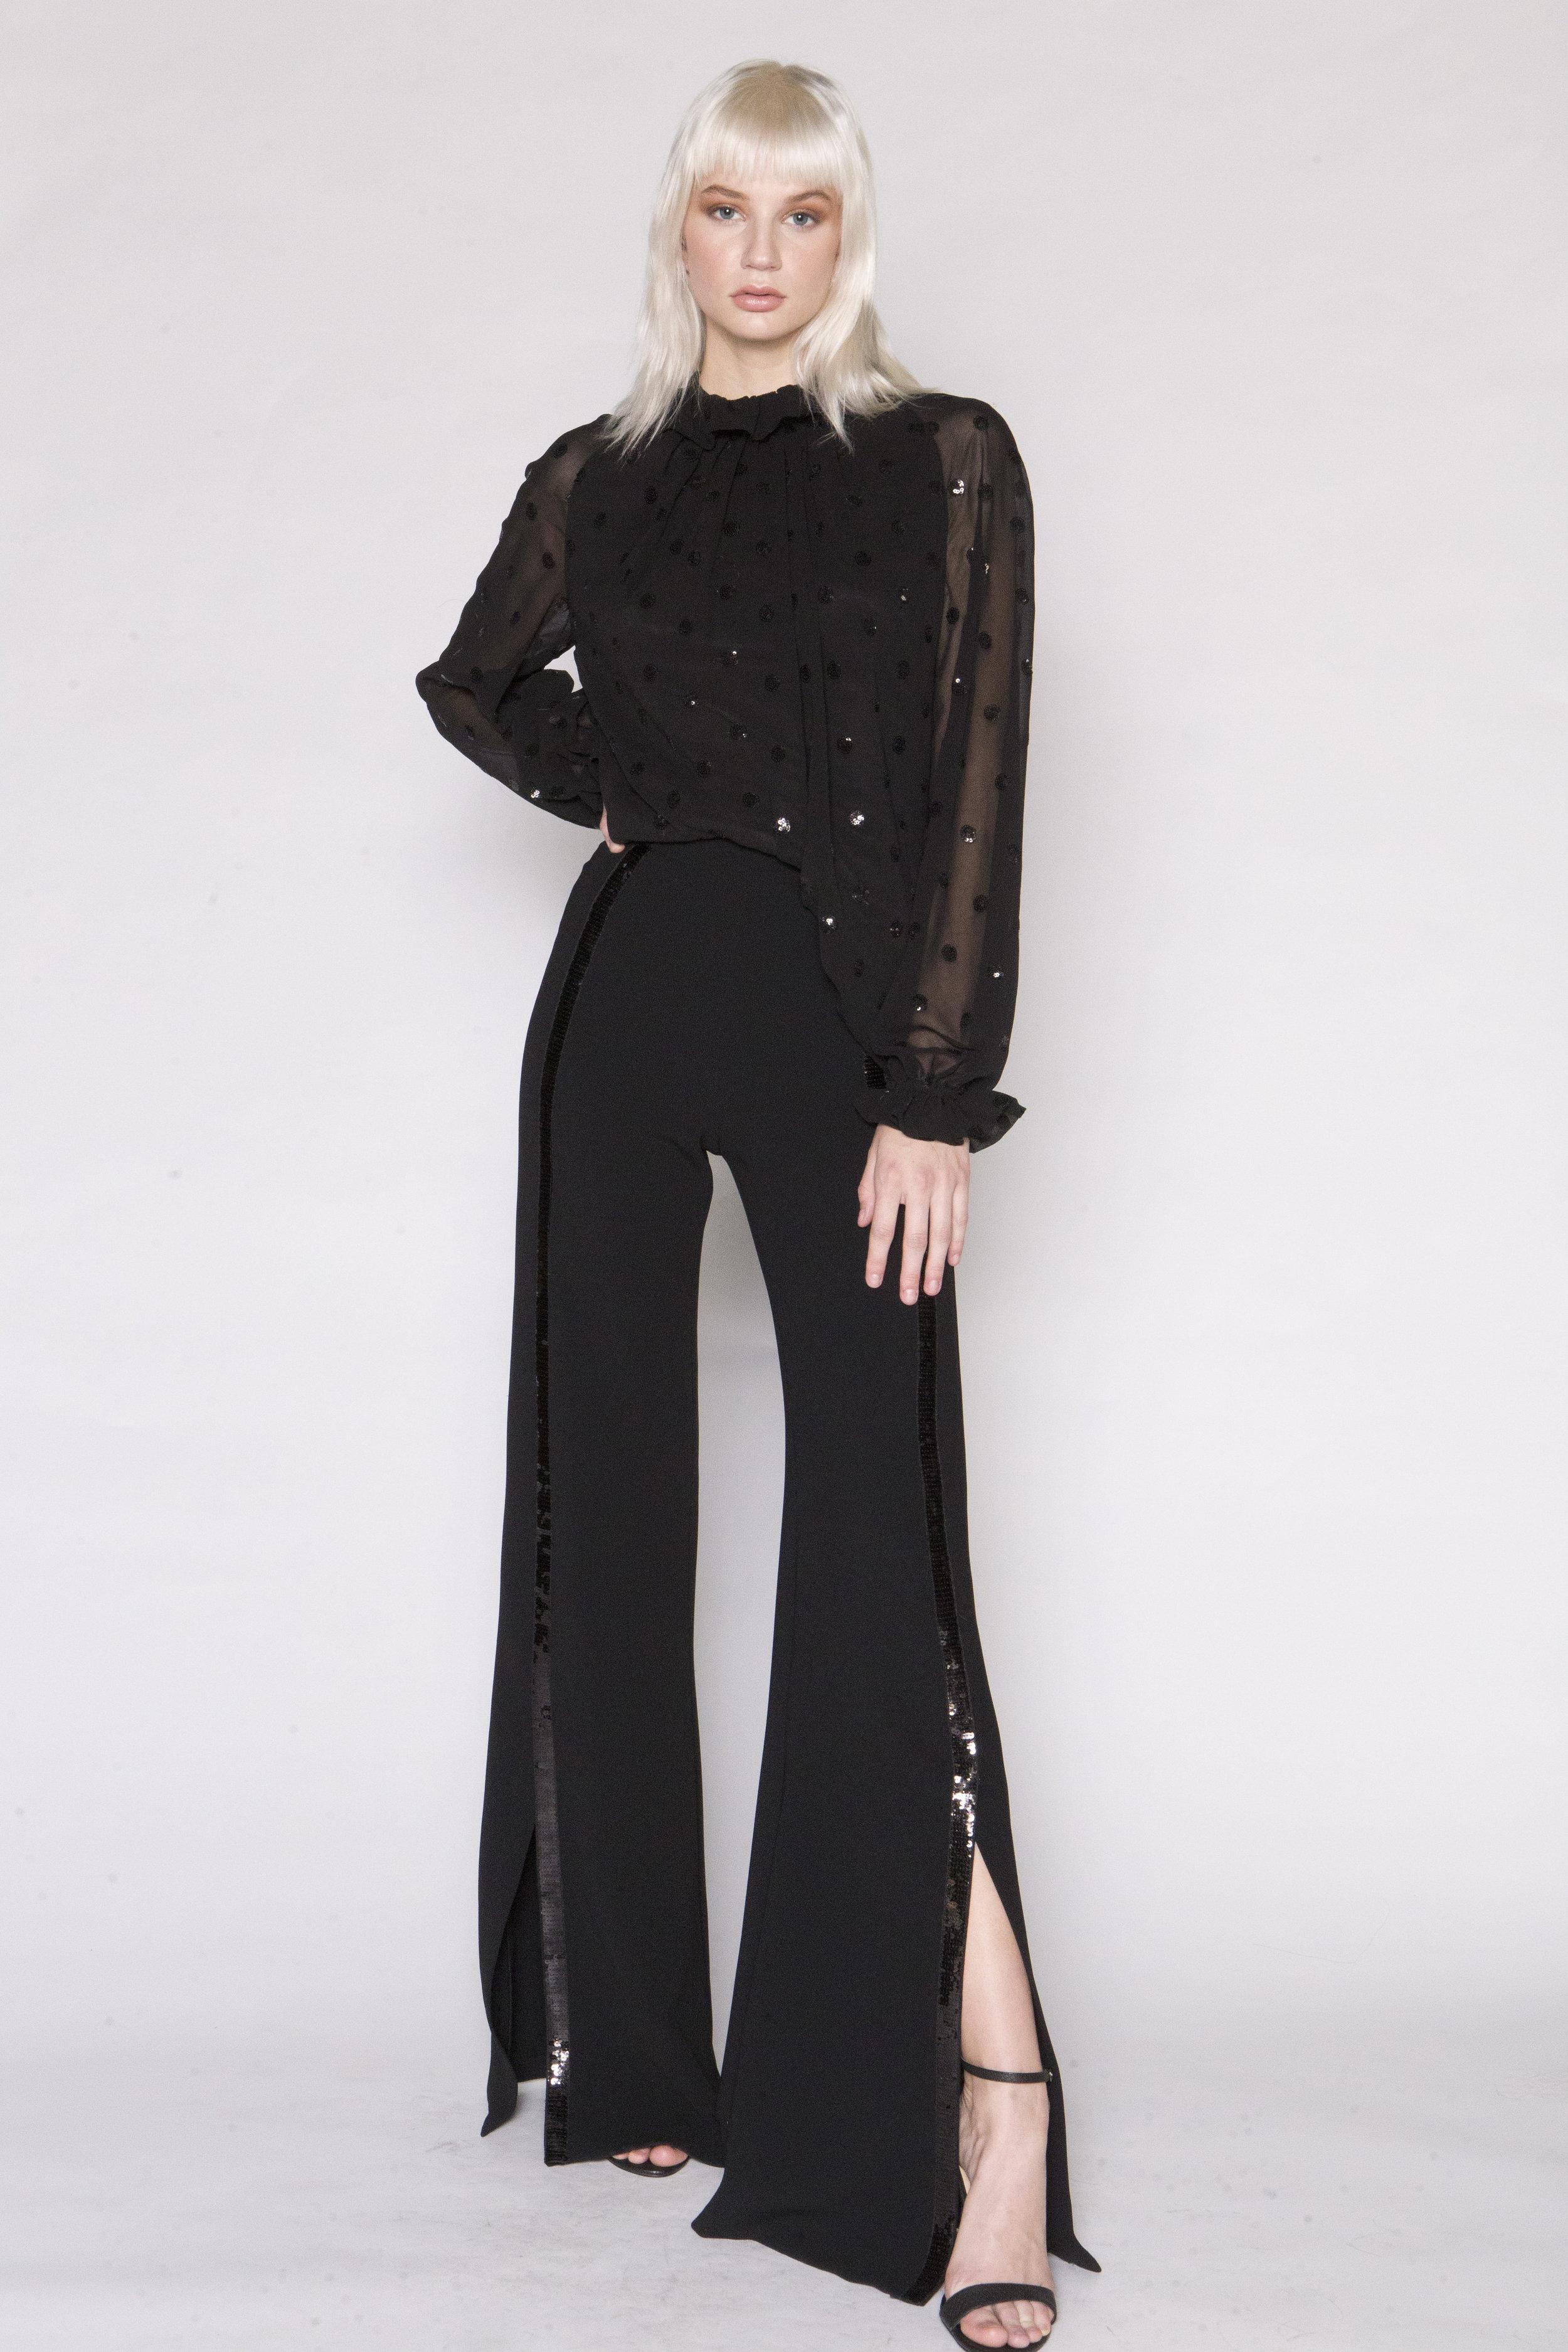 Sequin Dot Top w/Ruffle Neck and Black Tuxedo Split Pant w/Sequin Stripe